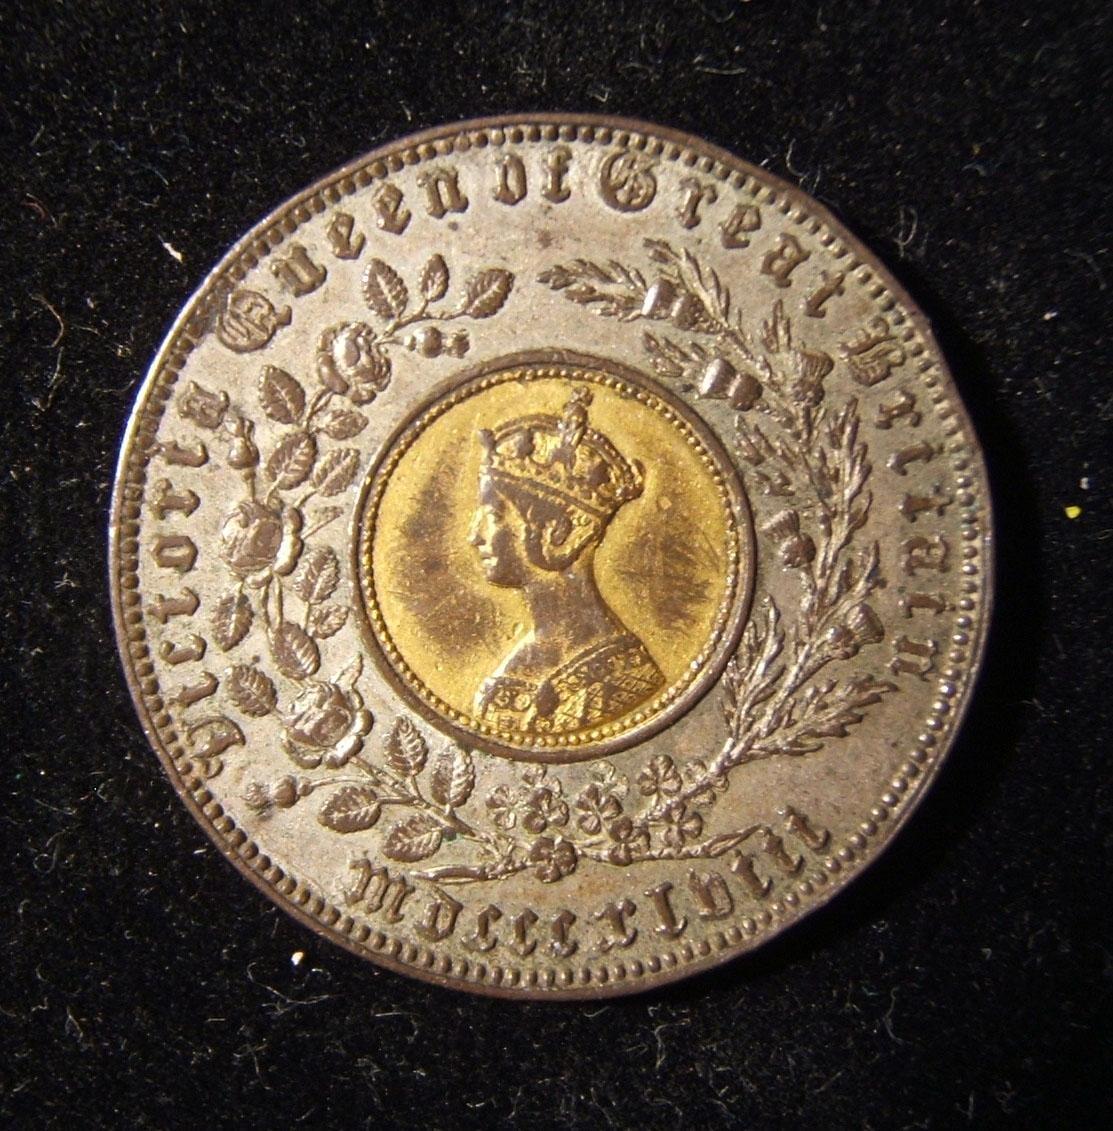 British Bimetallic Model Crown Token / Toy Money by Hyam Hyams & Joseph Moore 1848